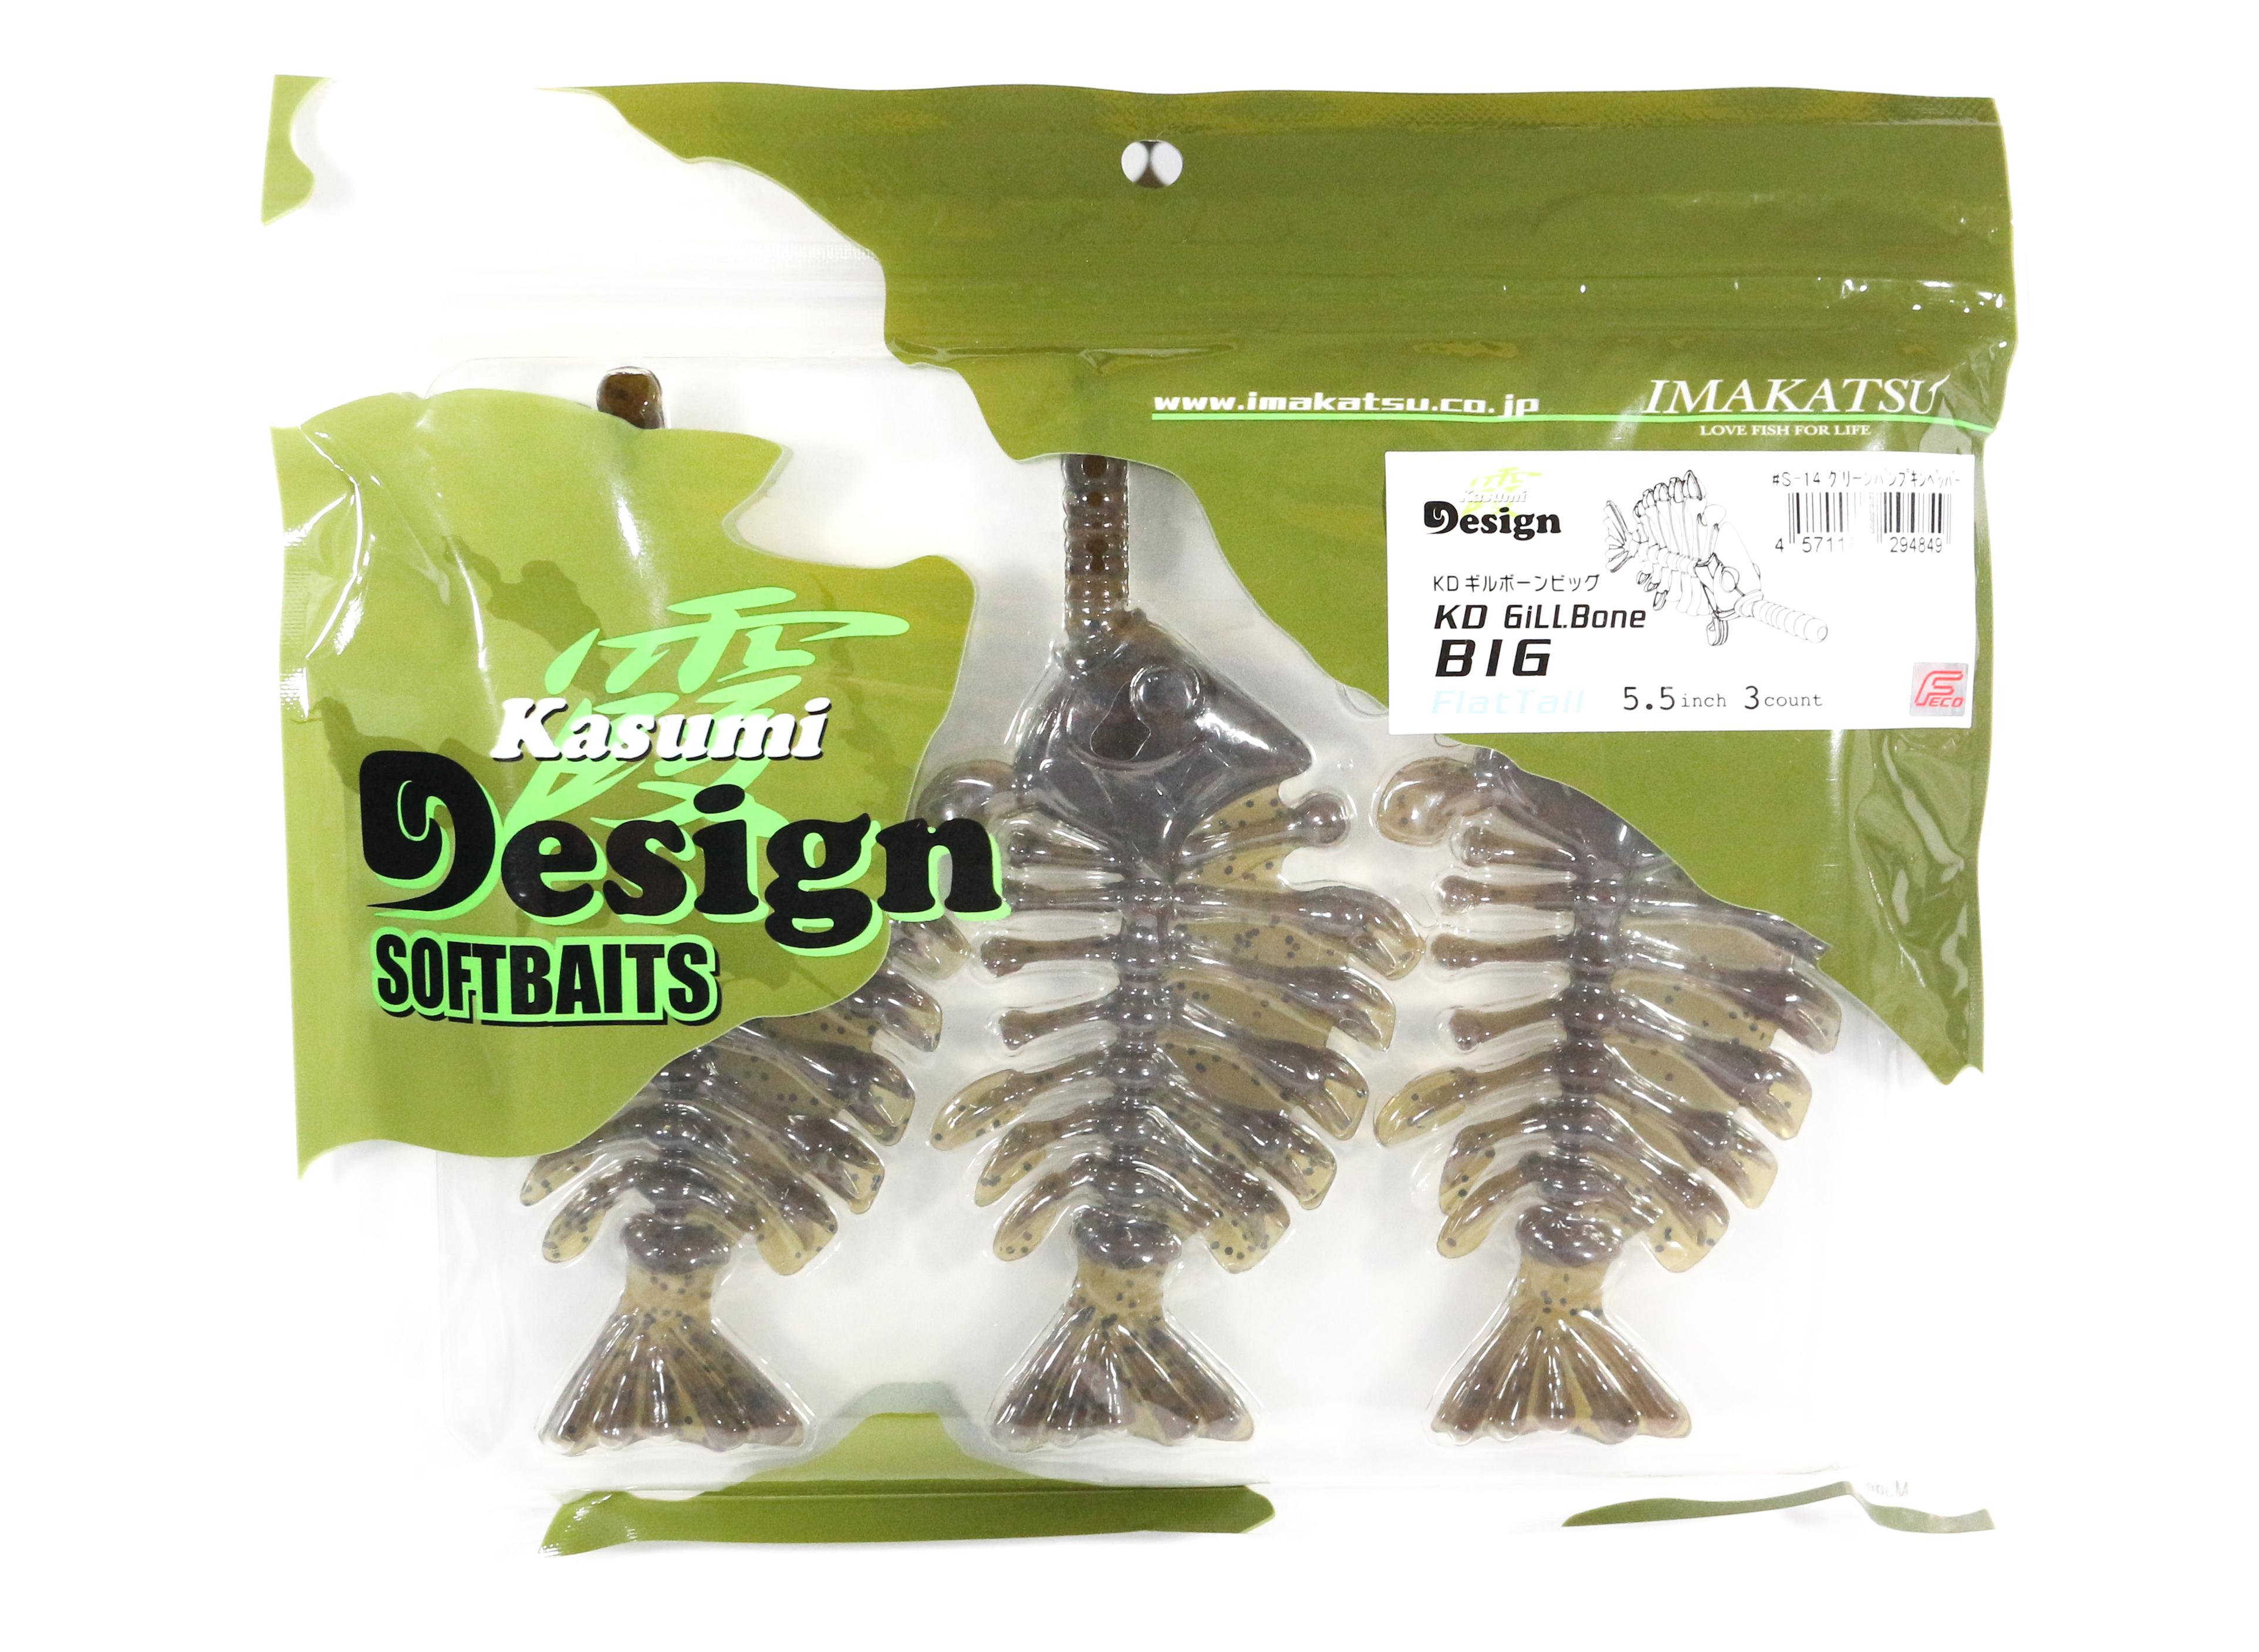 Sale Imakatsu Soft Lure Gill Bone Big Flat Tail 5.5 Inches S-14 (4849)